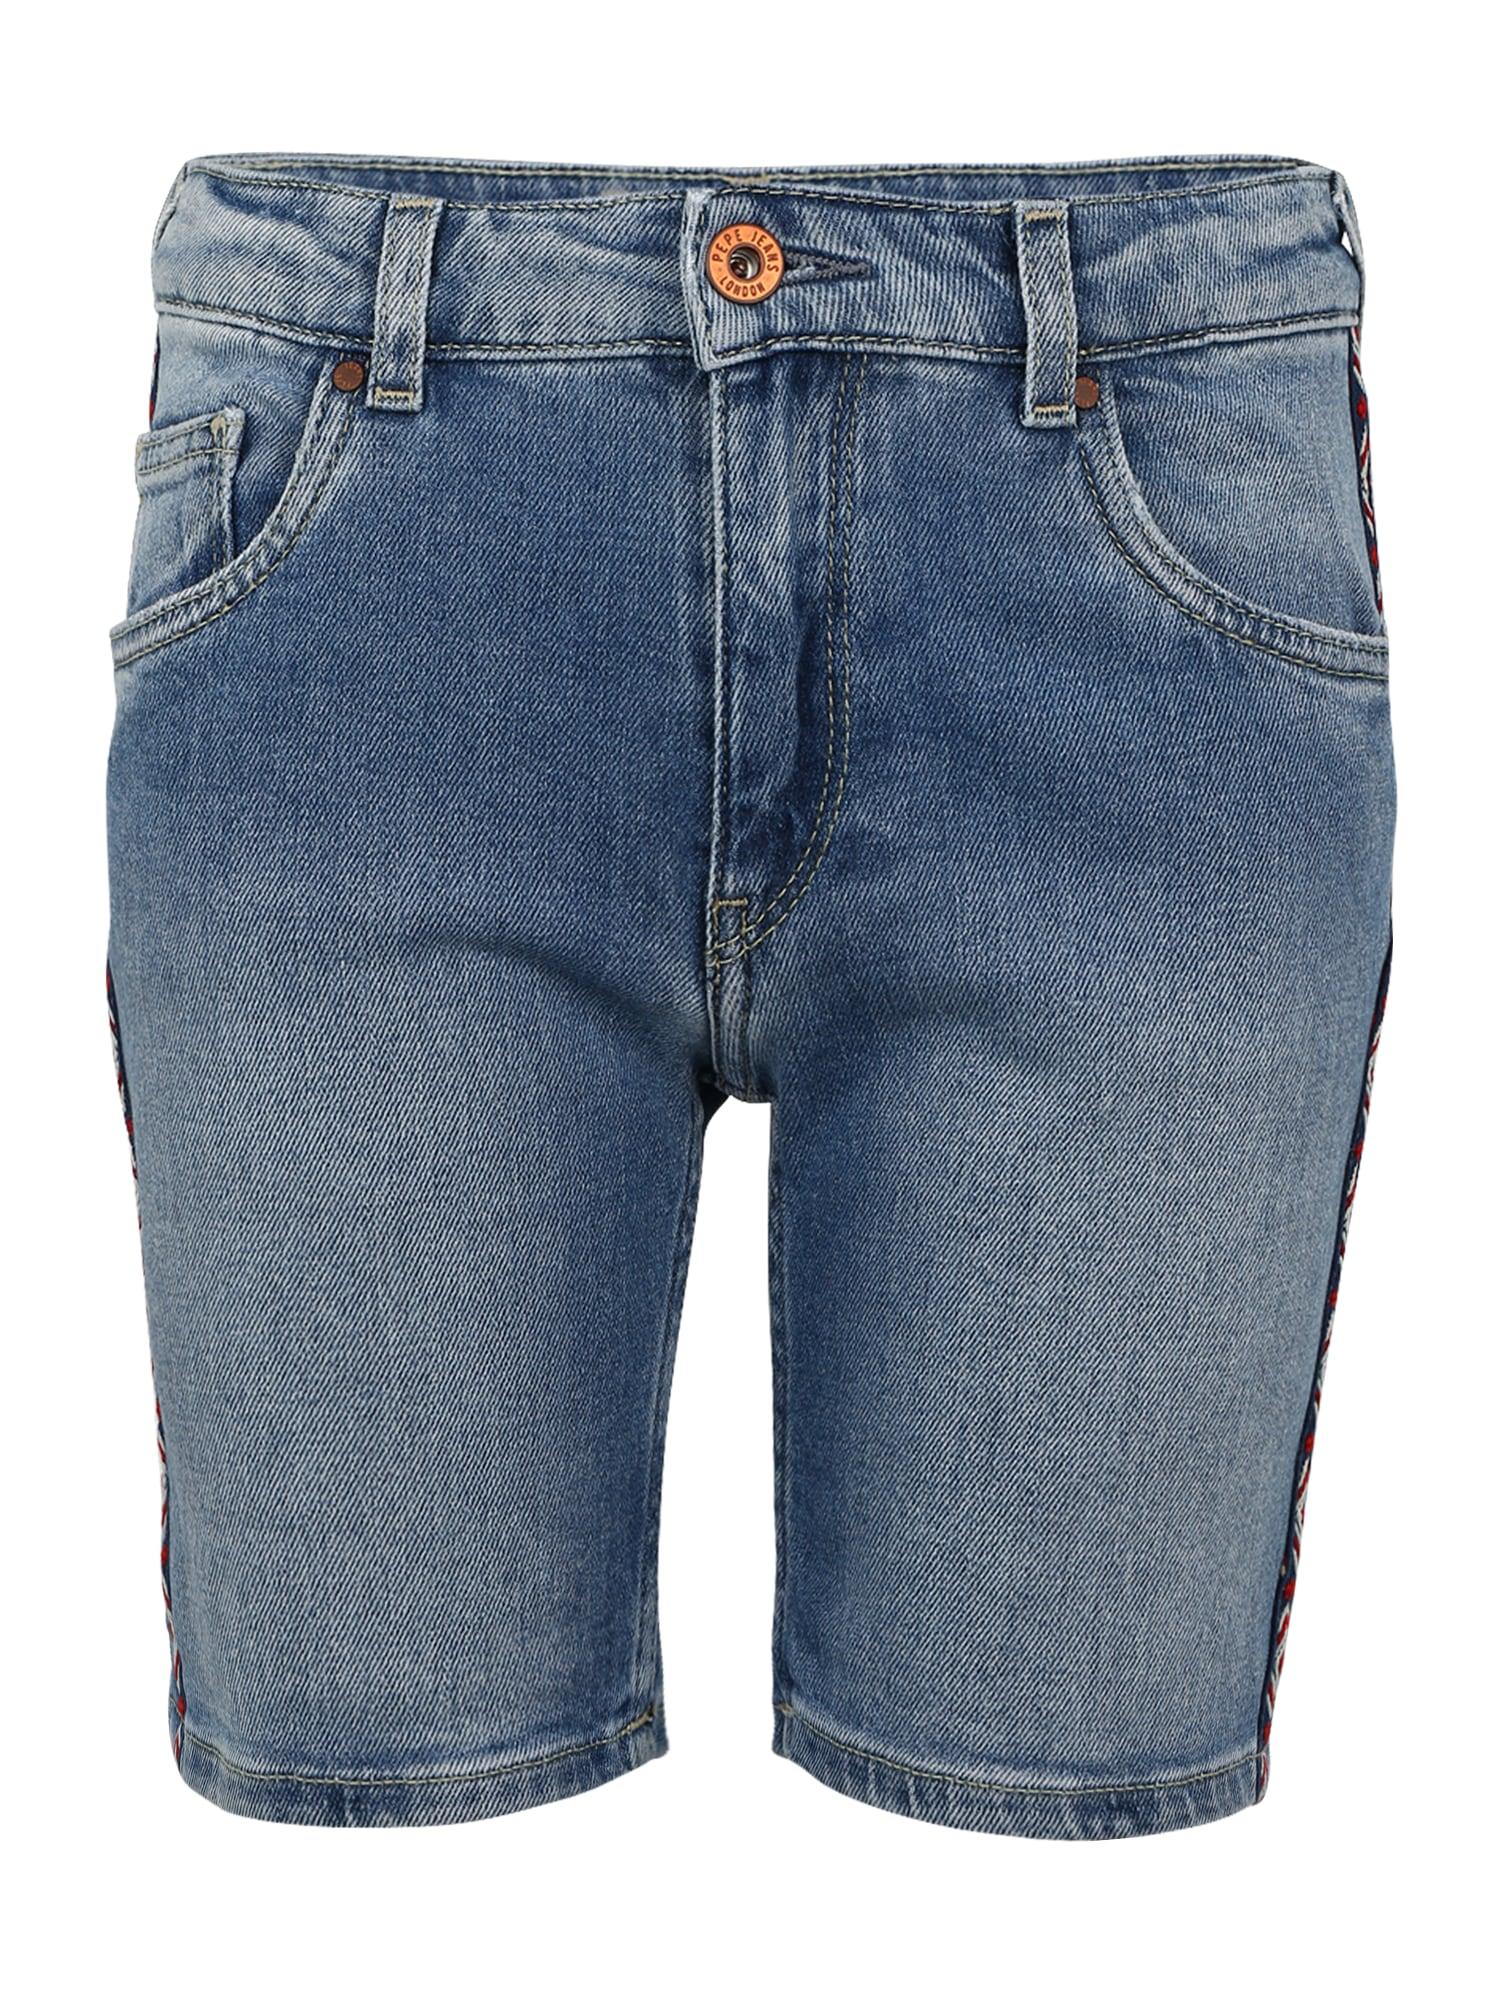 Pepe Jeans Meisjes Jeans MELANIE ZIG ZAG blue denim